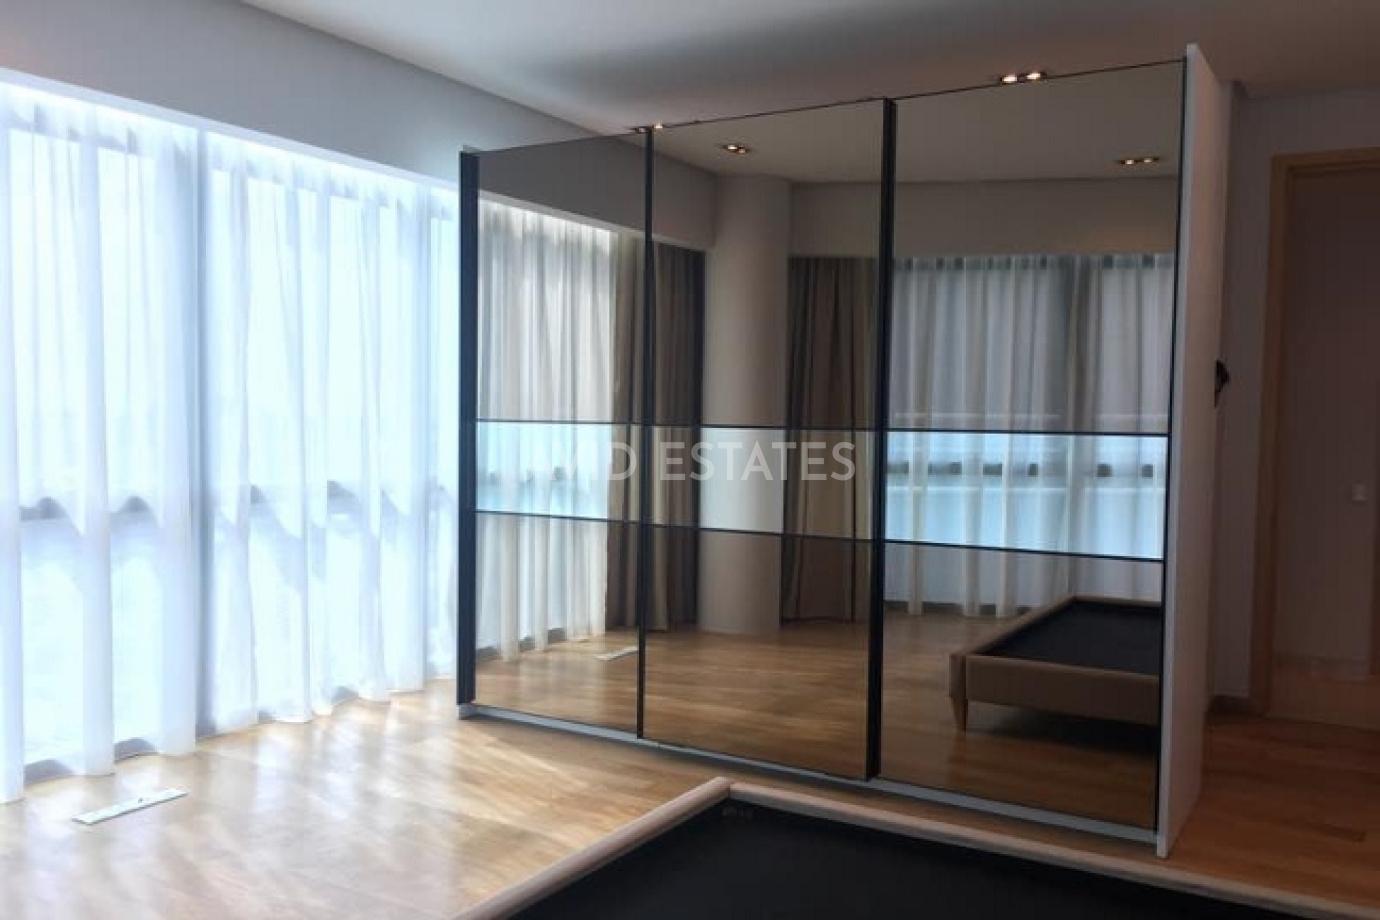 DC Residency, Damansara Heights,Kuala Lumpur, 3 Bedrooms Bedrooms, ,4.5 BathroomsBathrooms,Condominium / Serviced Residence,To Let,DC Residency,A-16-2, DC Residency,1428